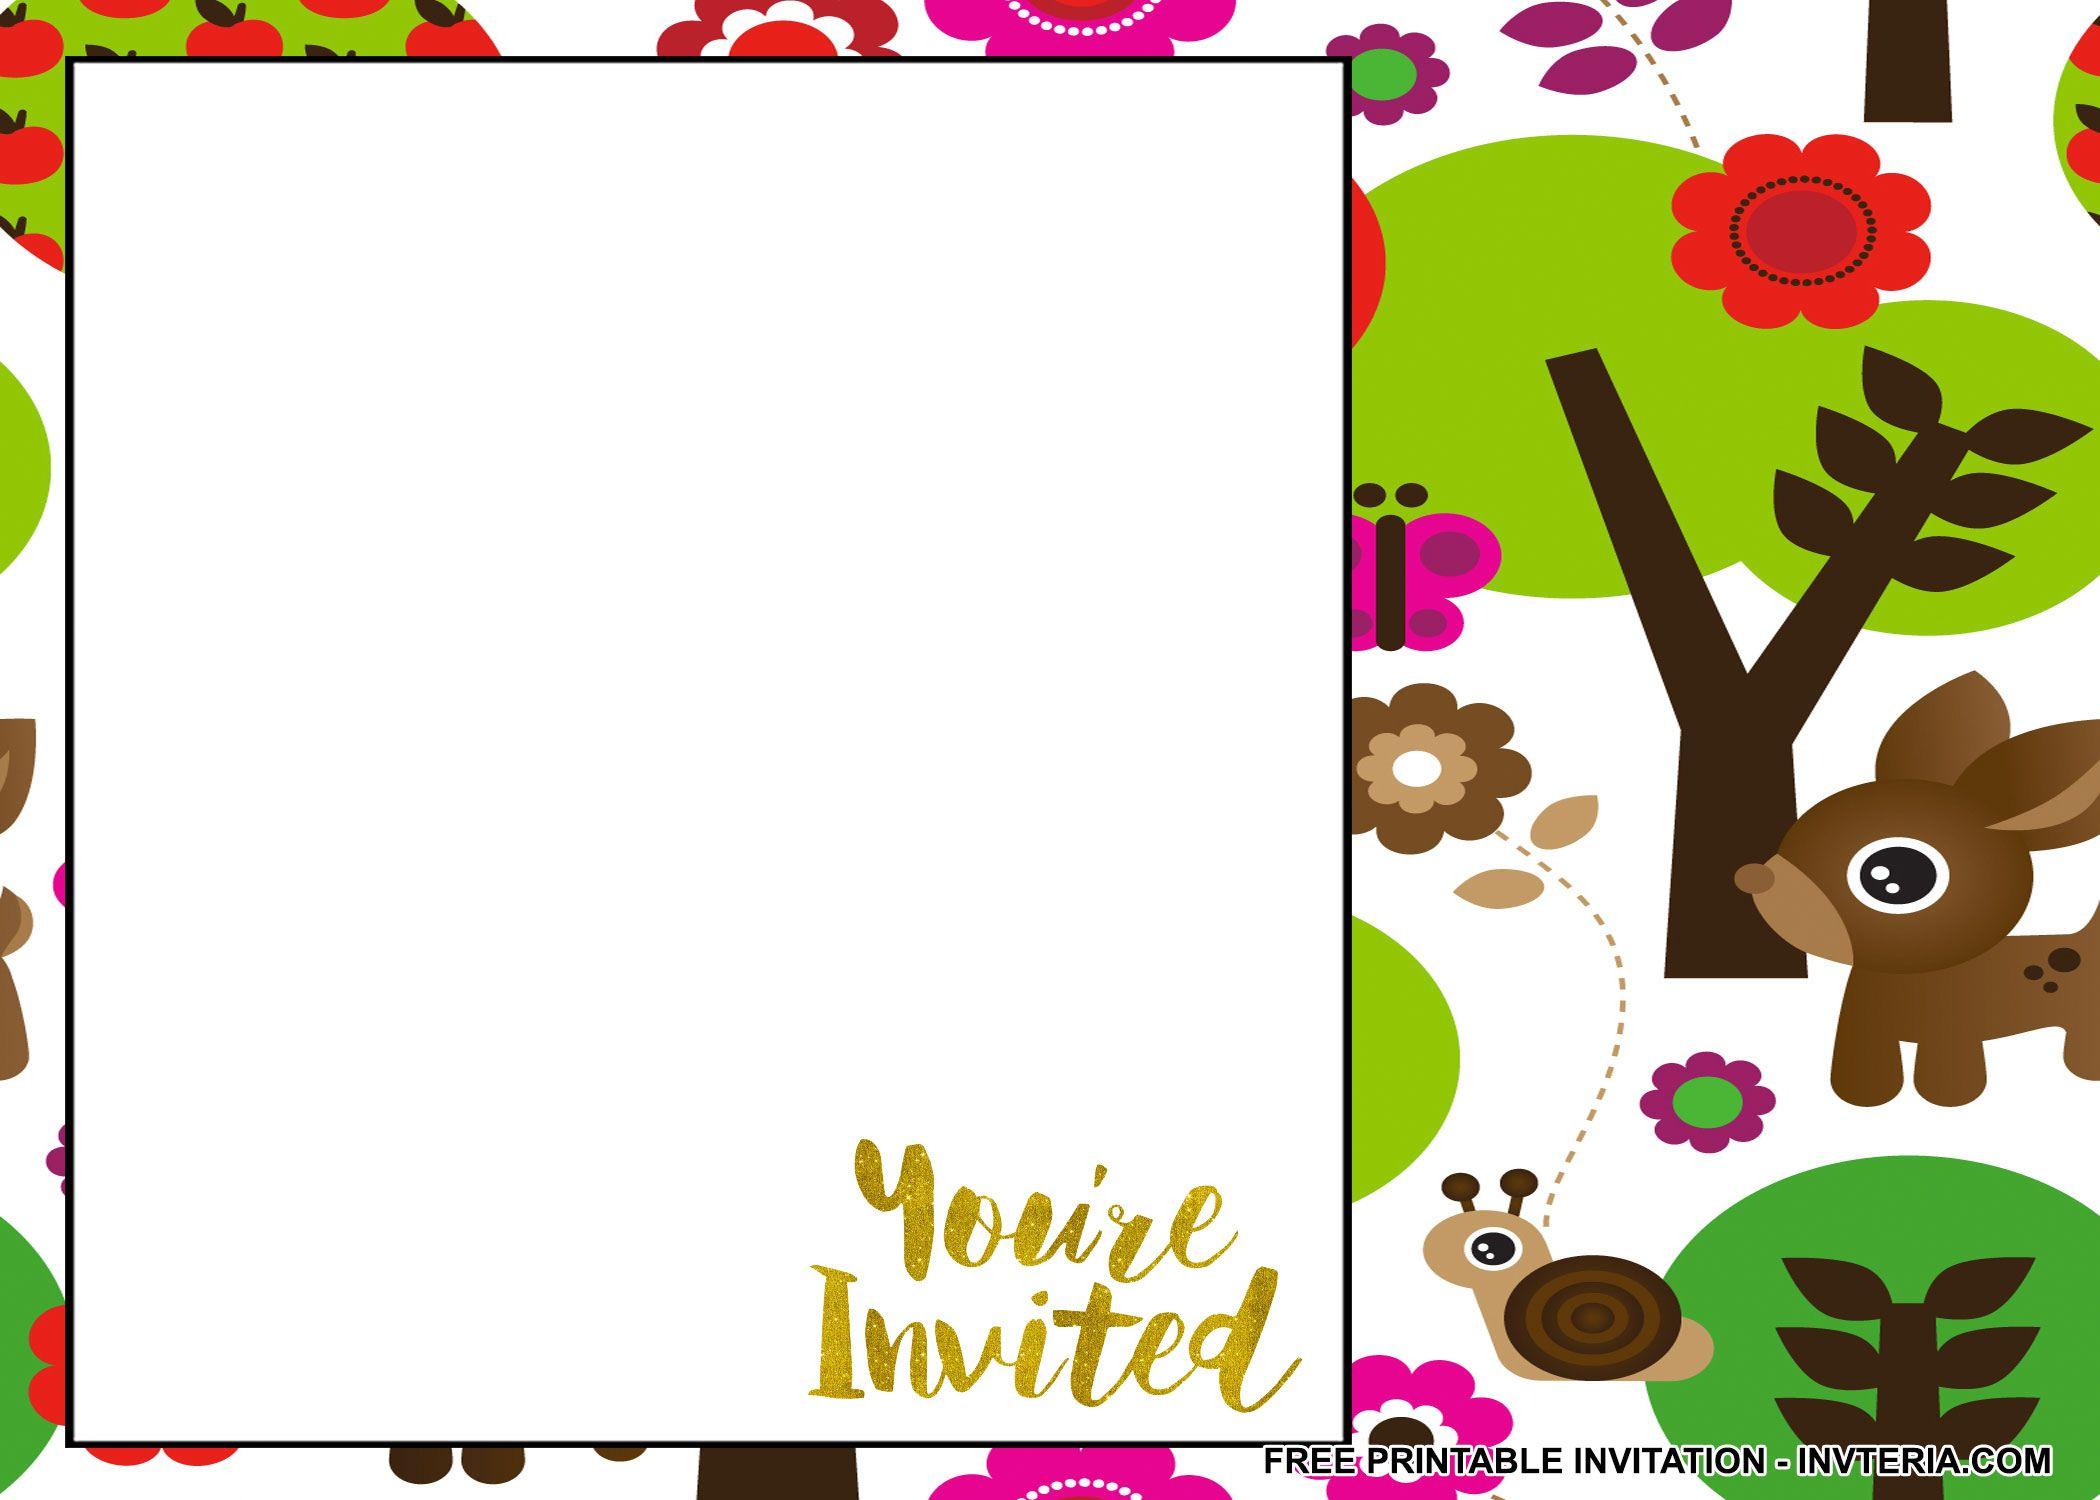 NICE FREE OWL 1ST BIRTHDAY INVITATIONS IDEA | Invitation Birthday ...